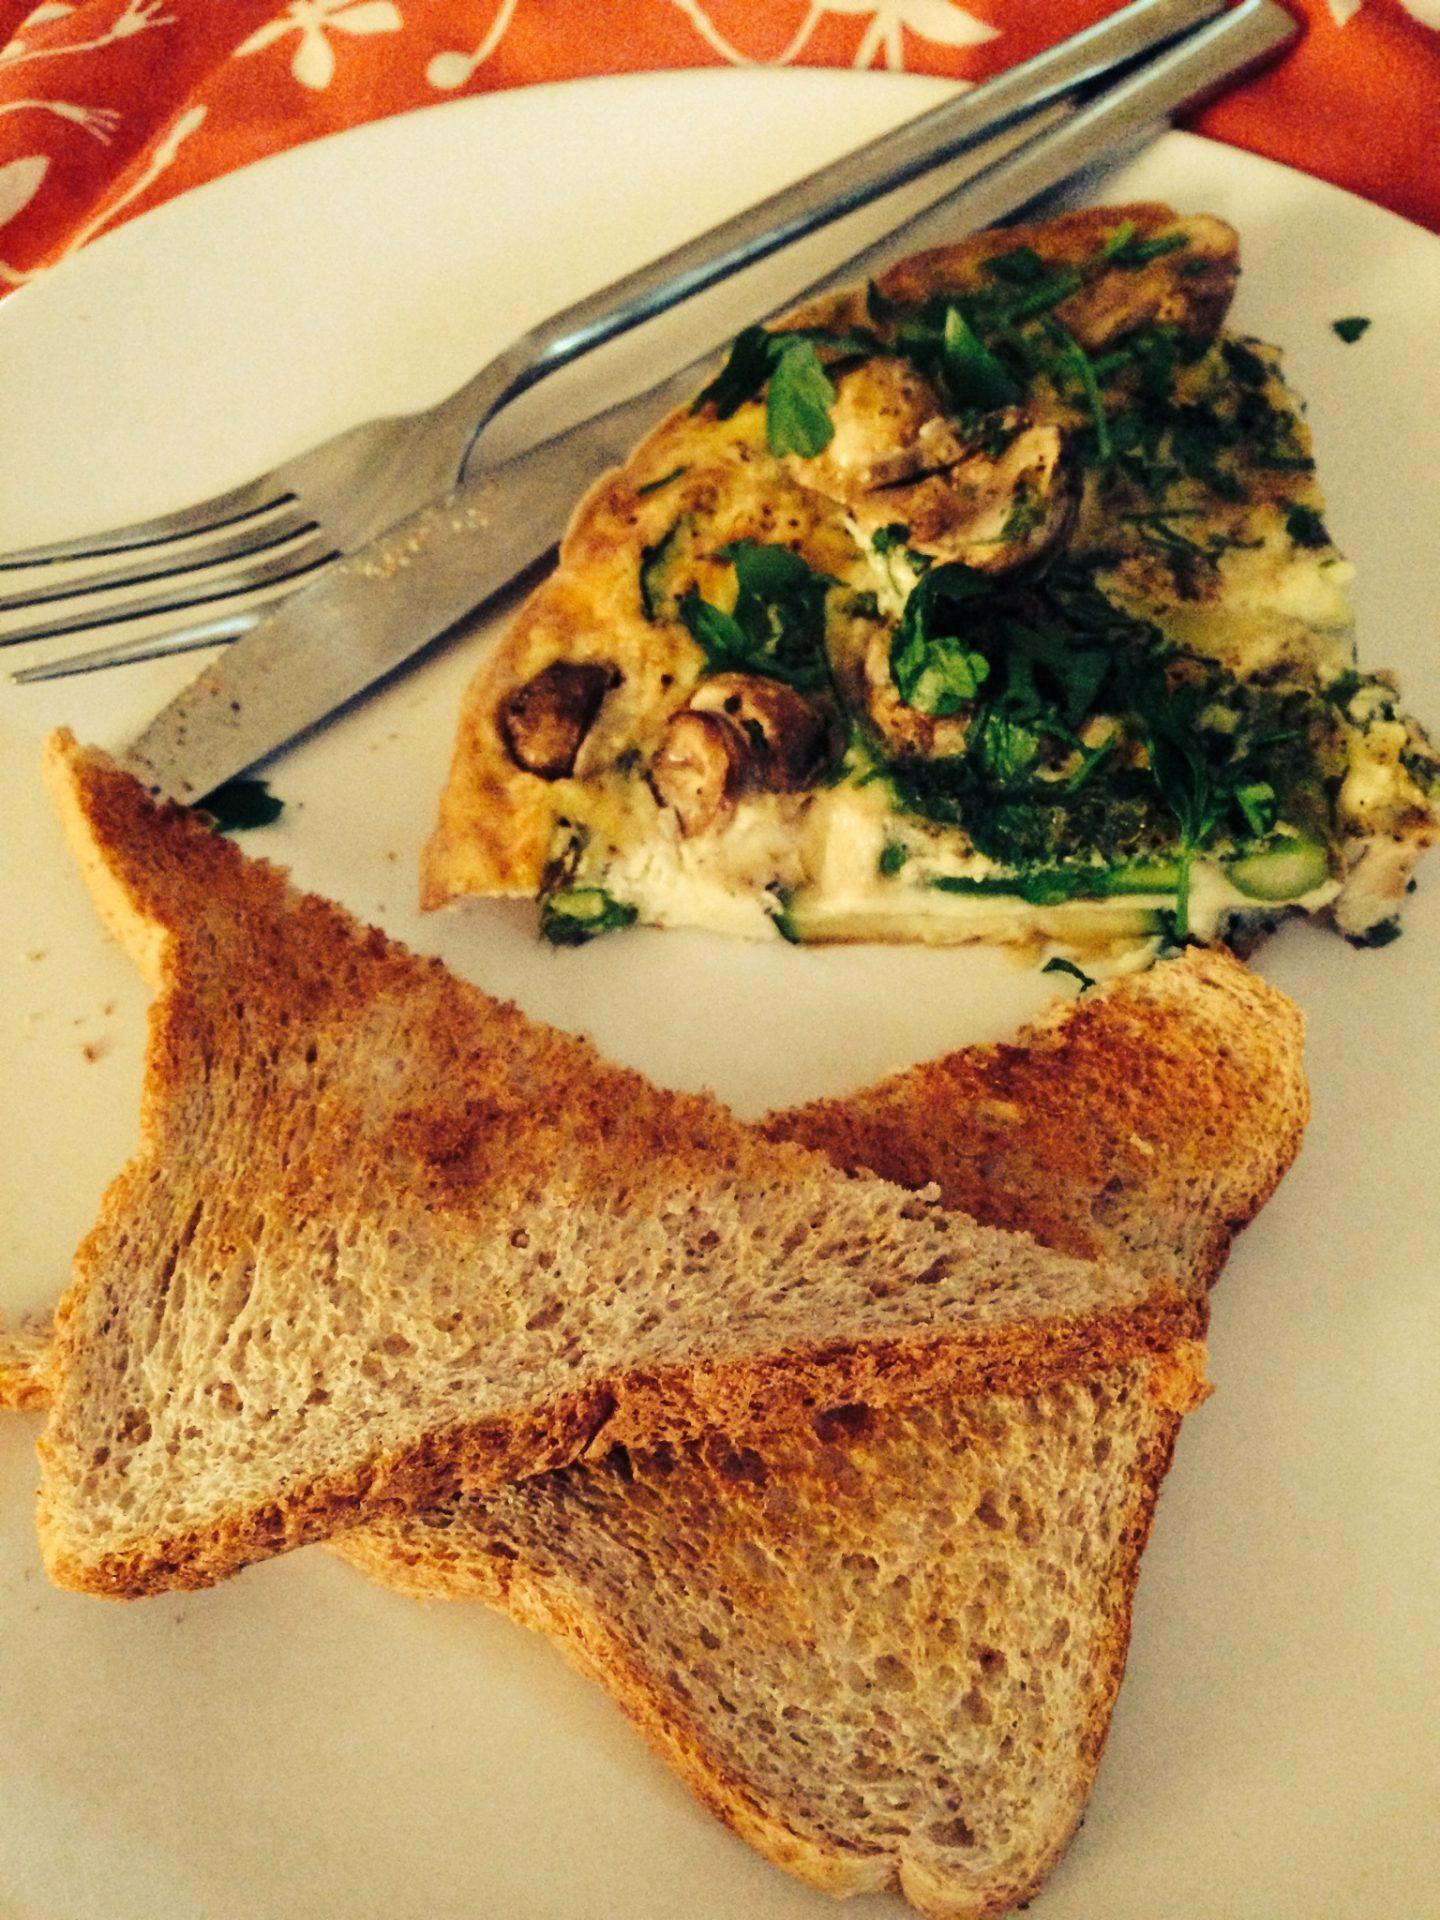 Recipe: Mushroom, Courgette & Asparagus Frittata